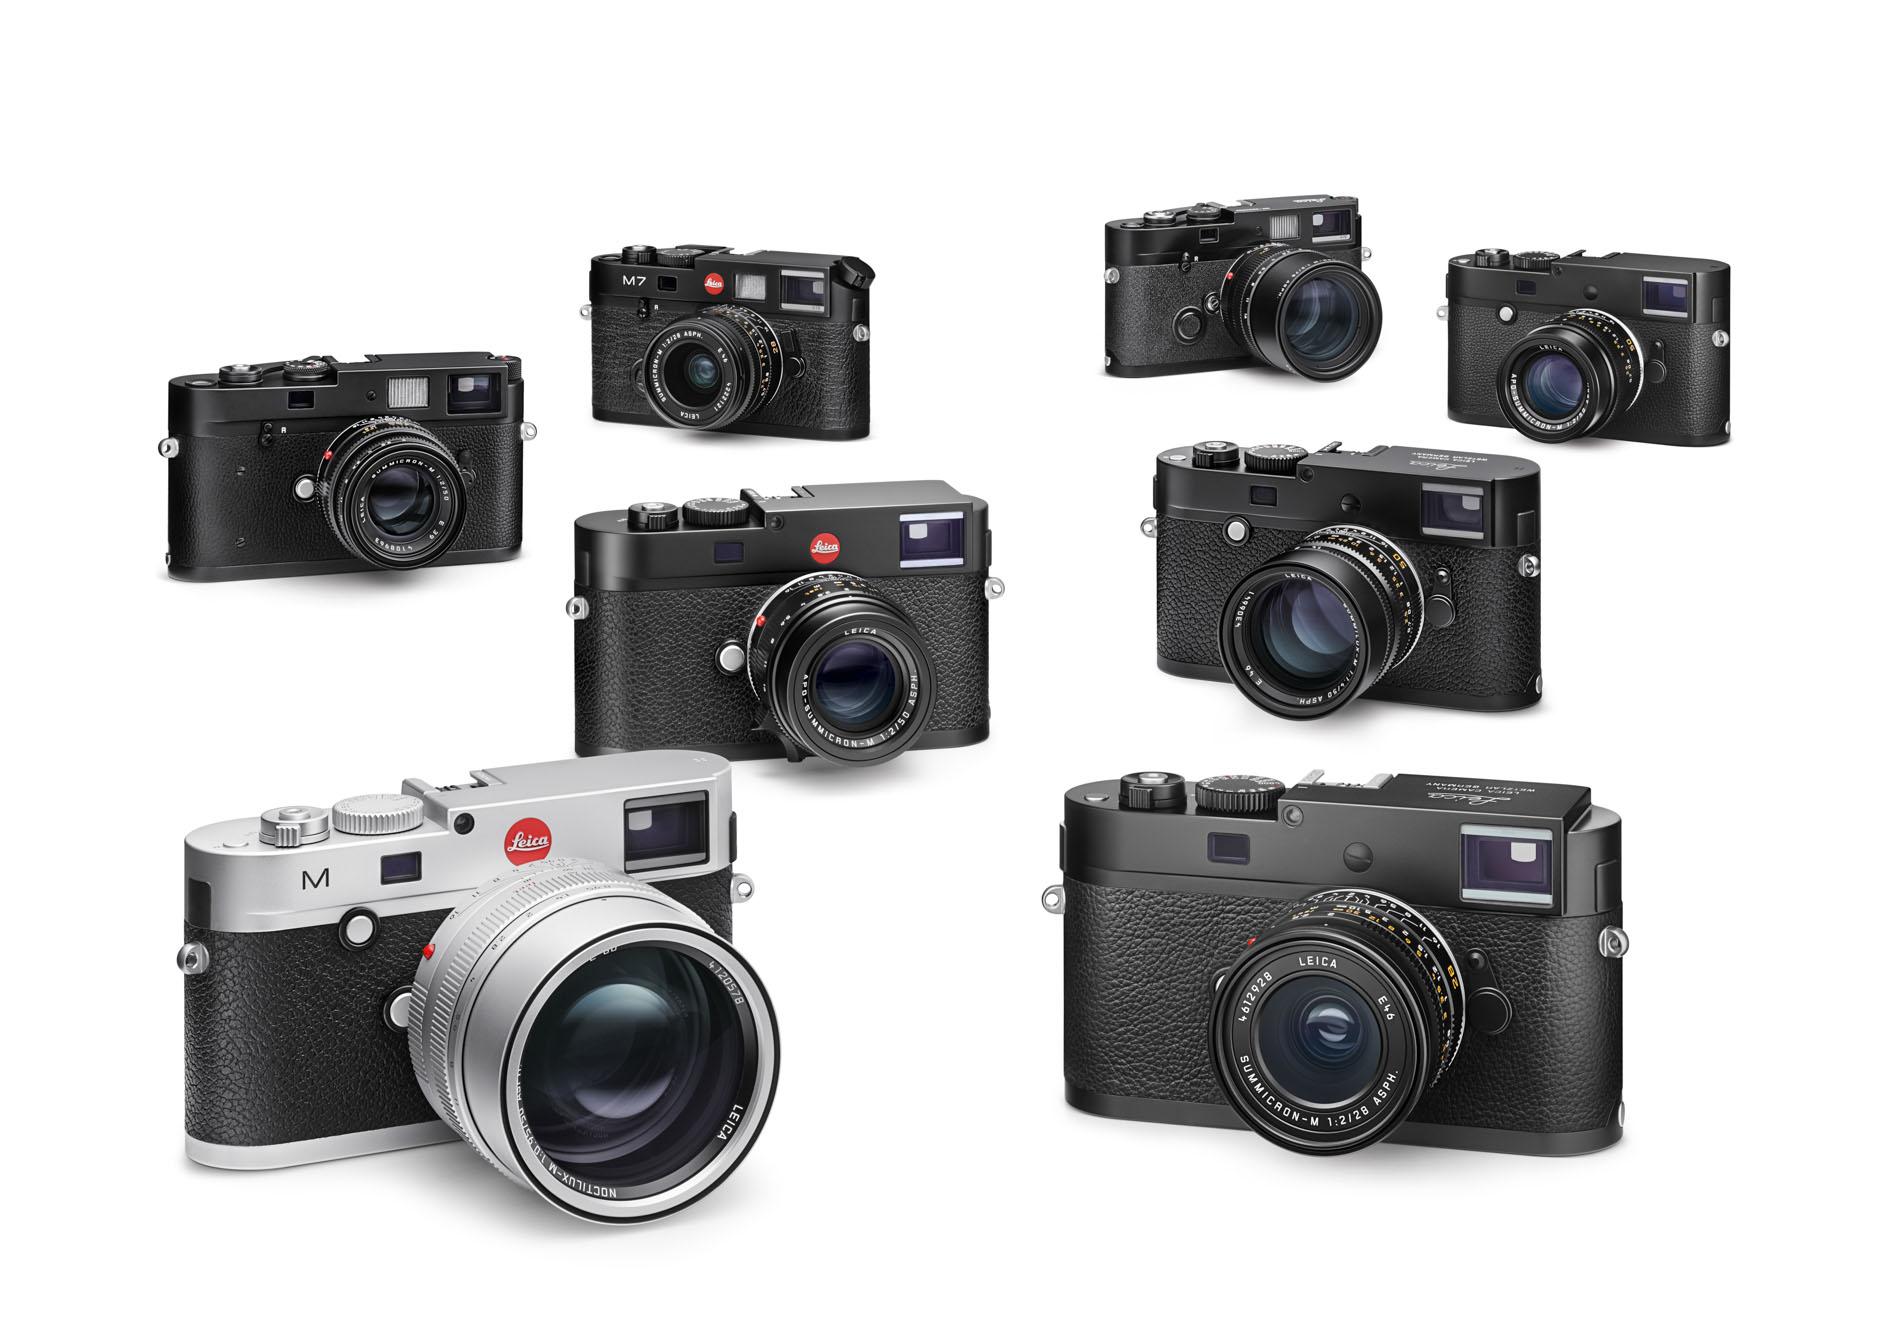 Großartig Leica M4 P Rahmenlinien Galerie - Rahmen Ideen ...